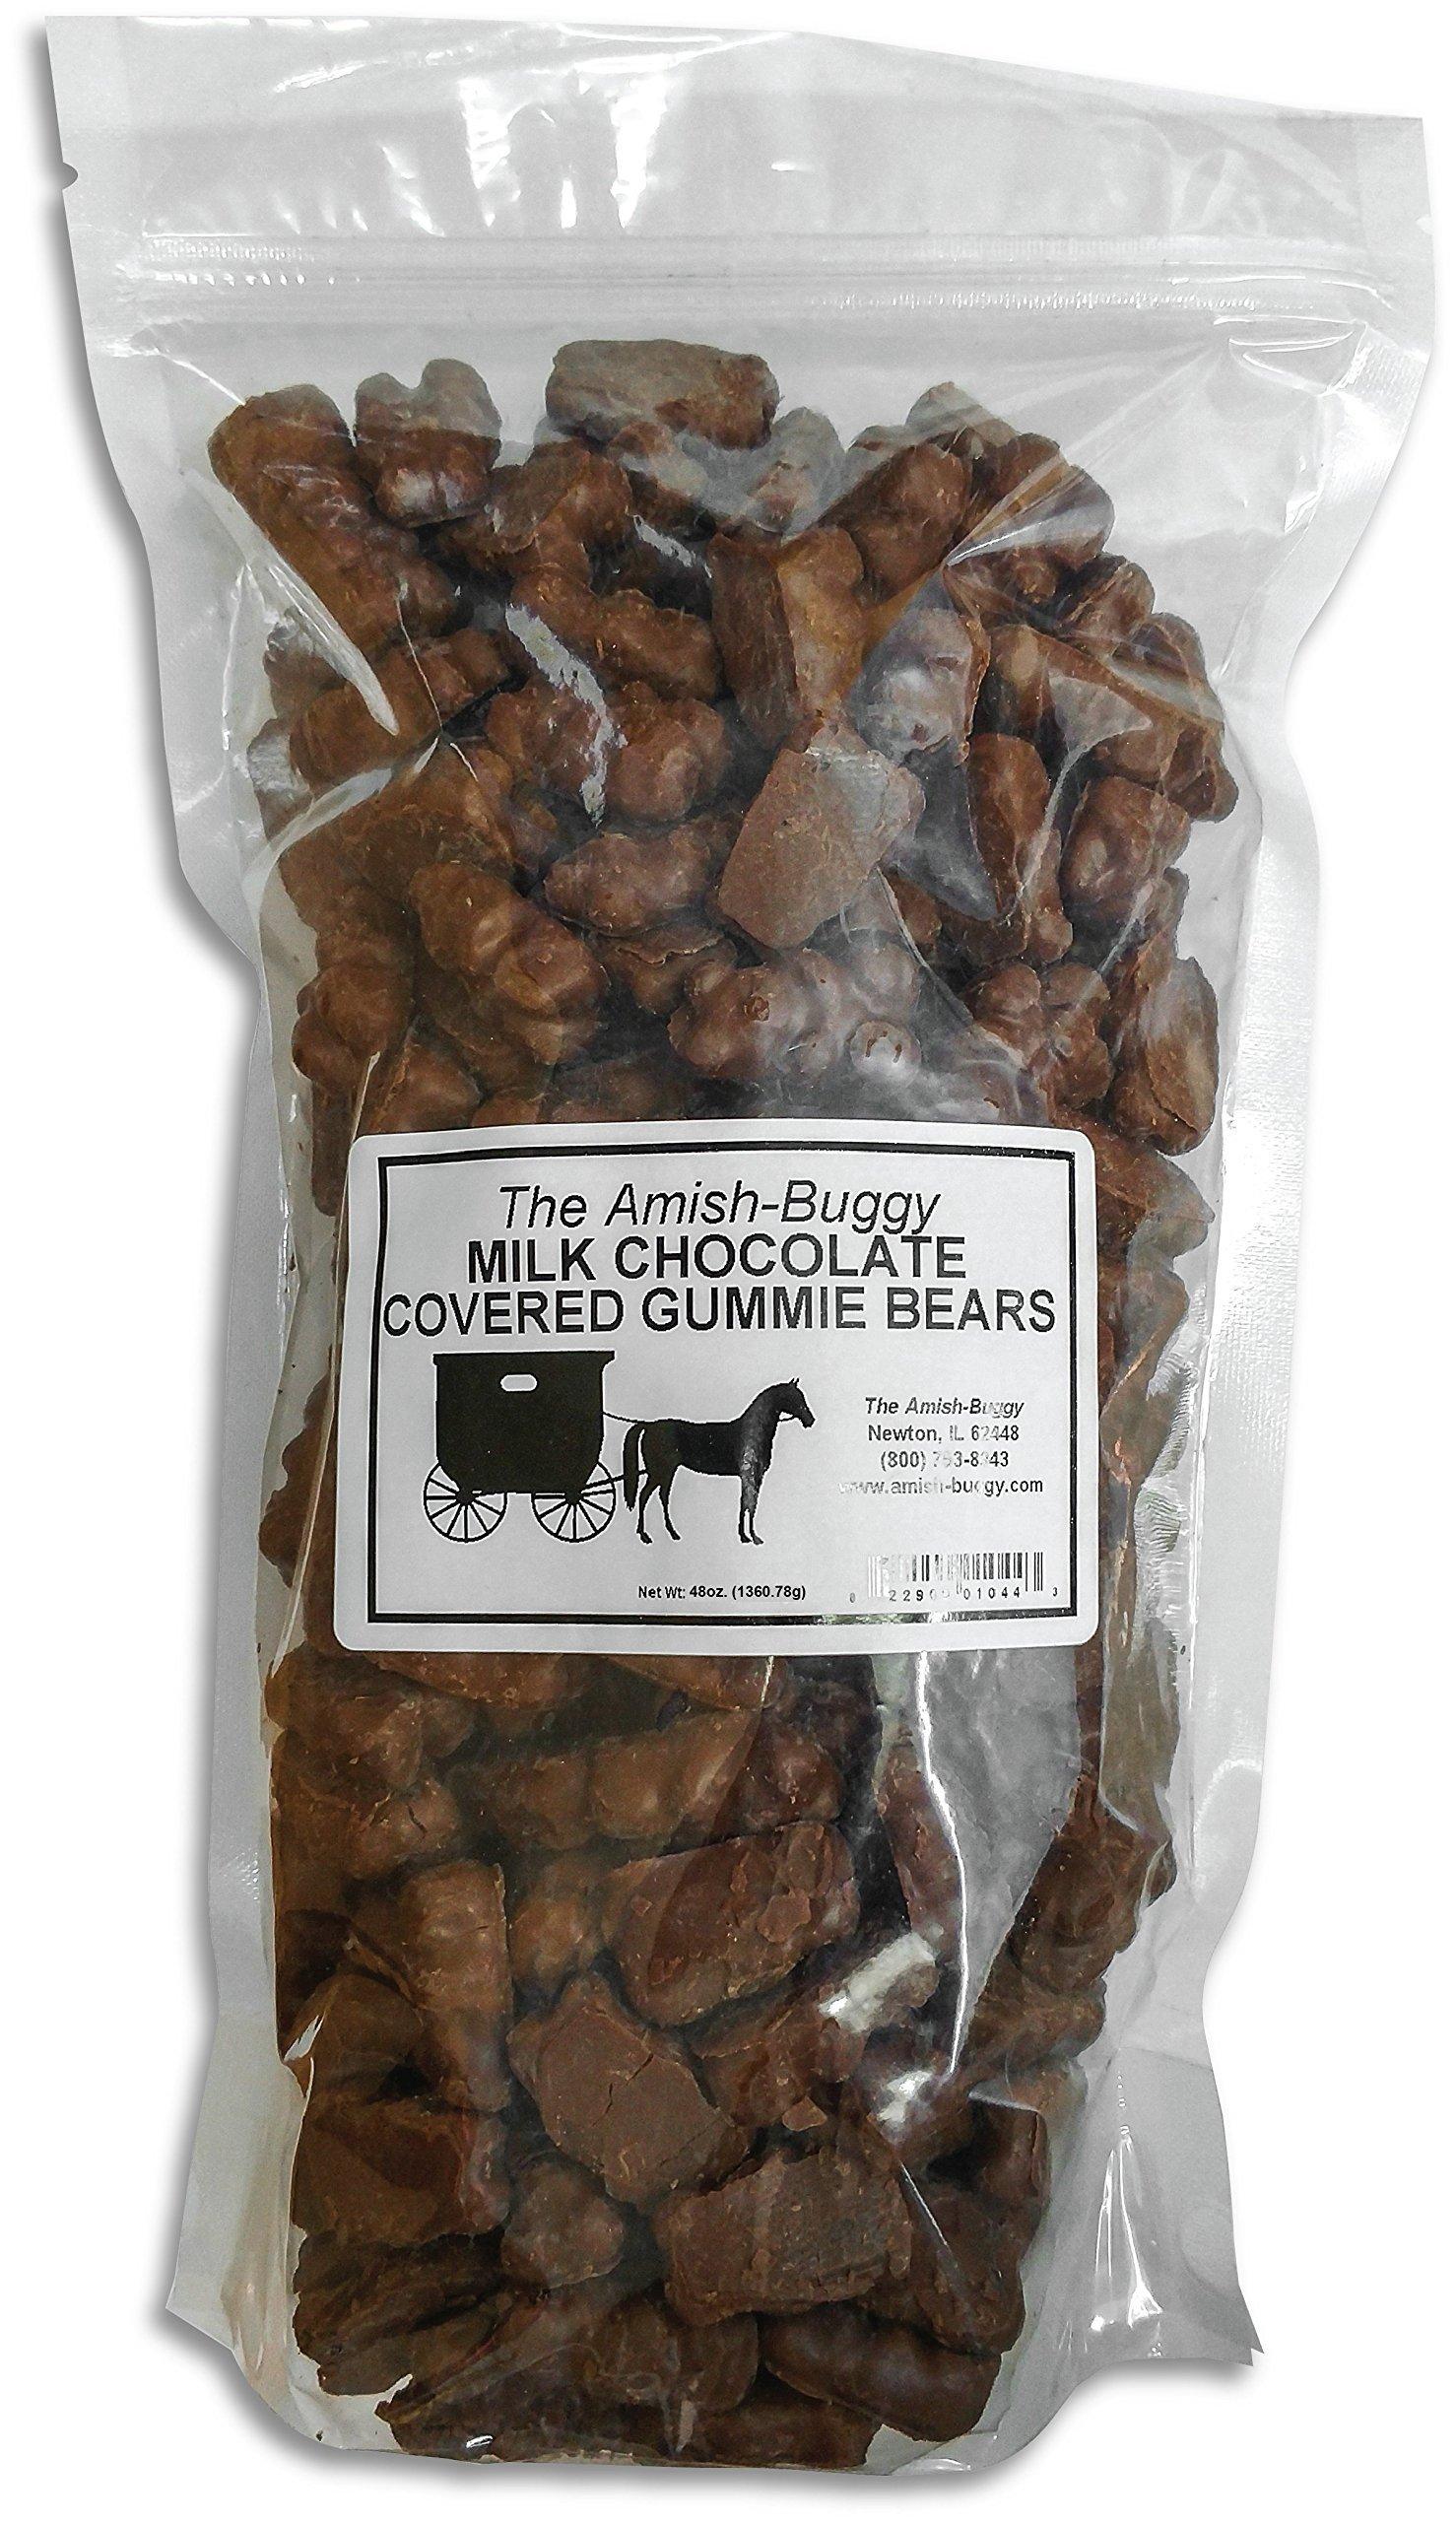 Milk Chocolate Covered Gummi Bears (3 Pound)